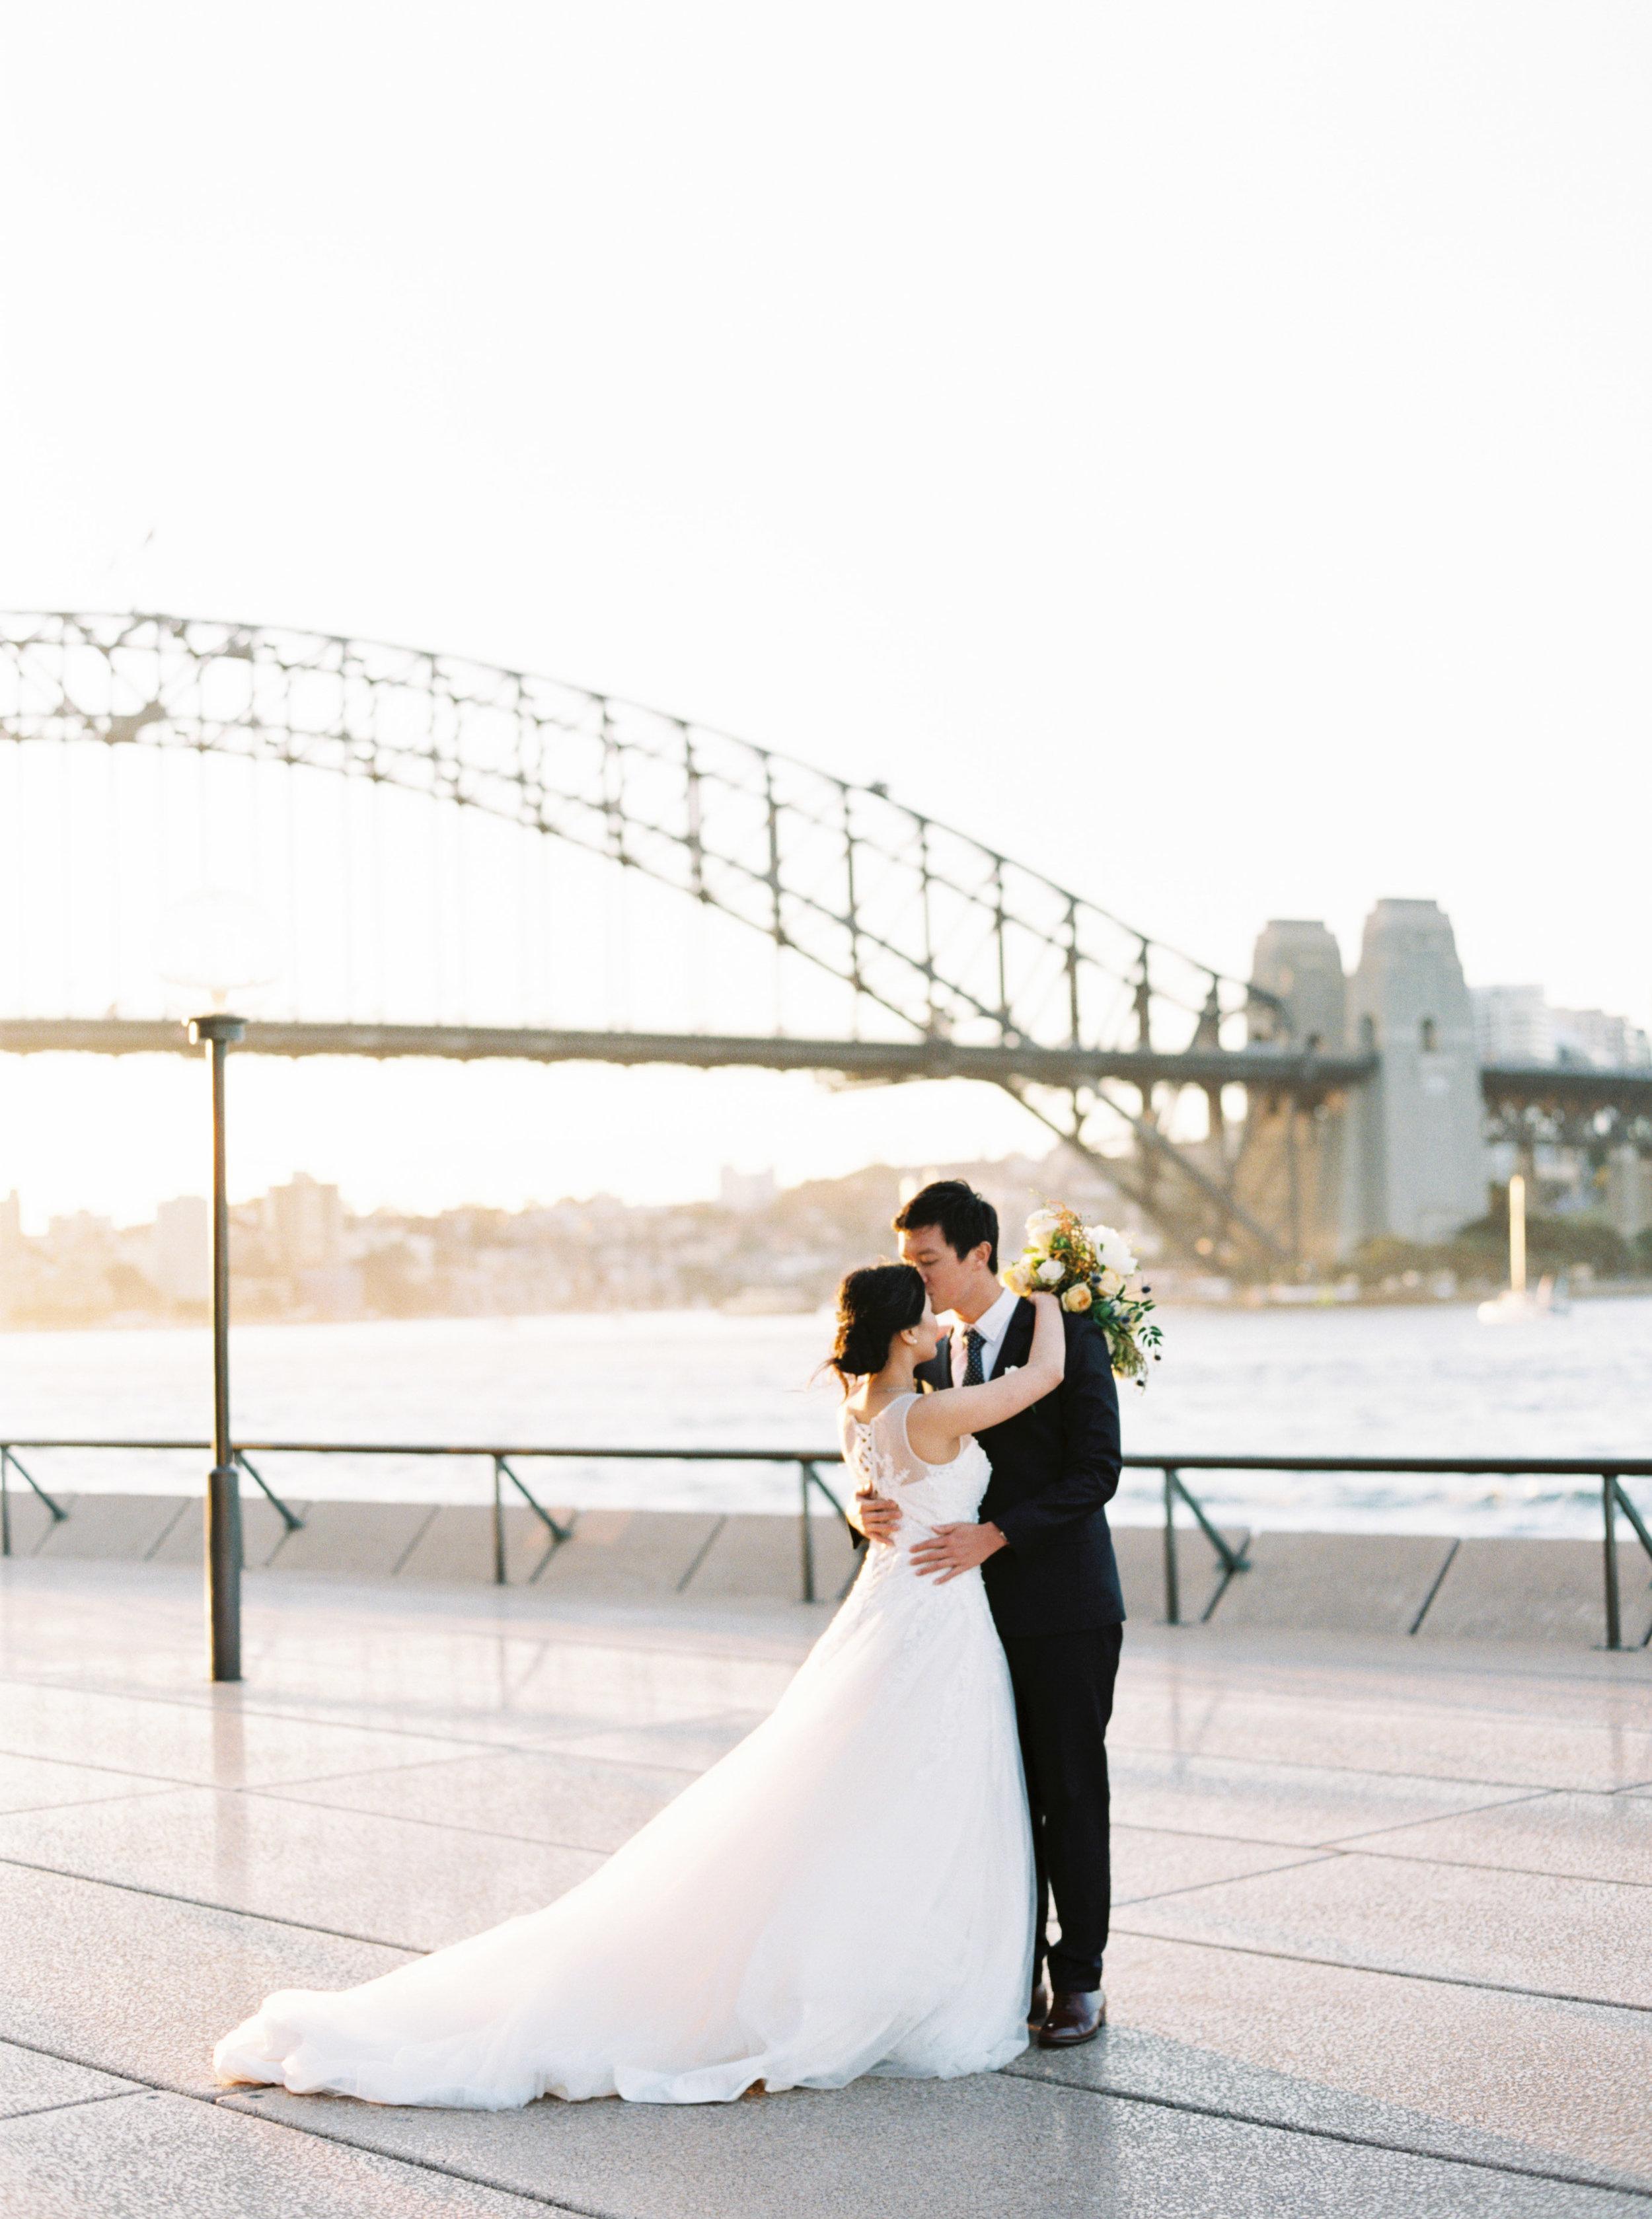 00044- Australia Sydney Wedding Photographer Sheri McMahon.jpg